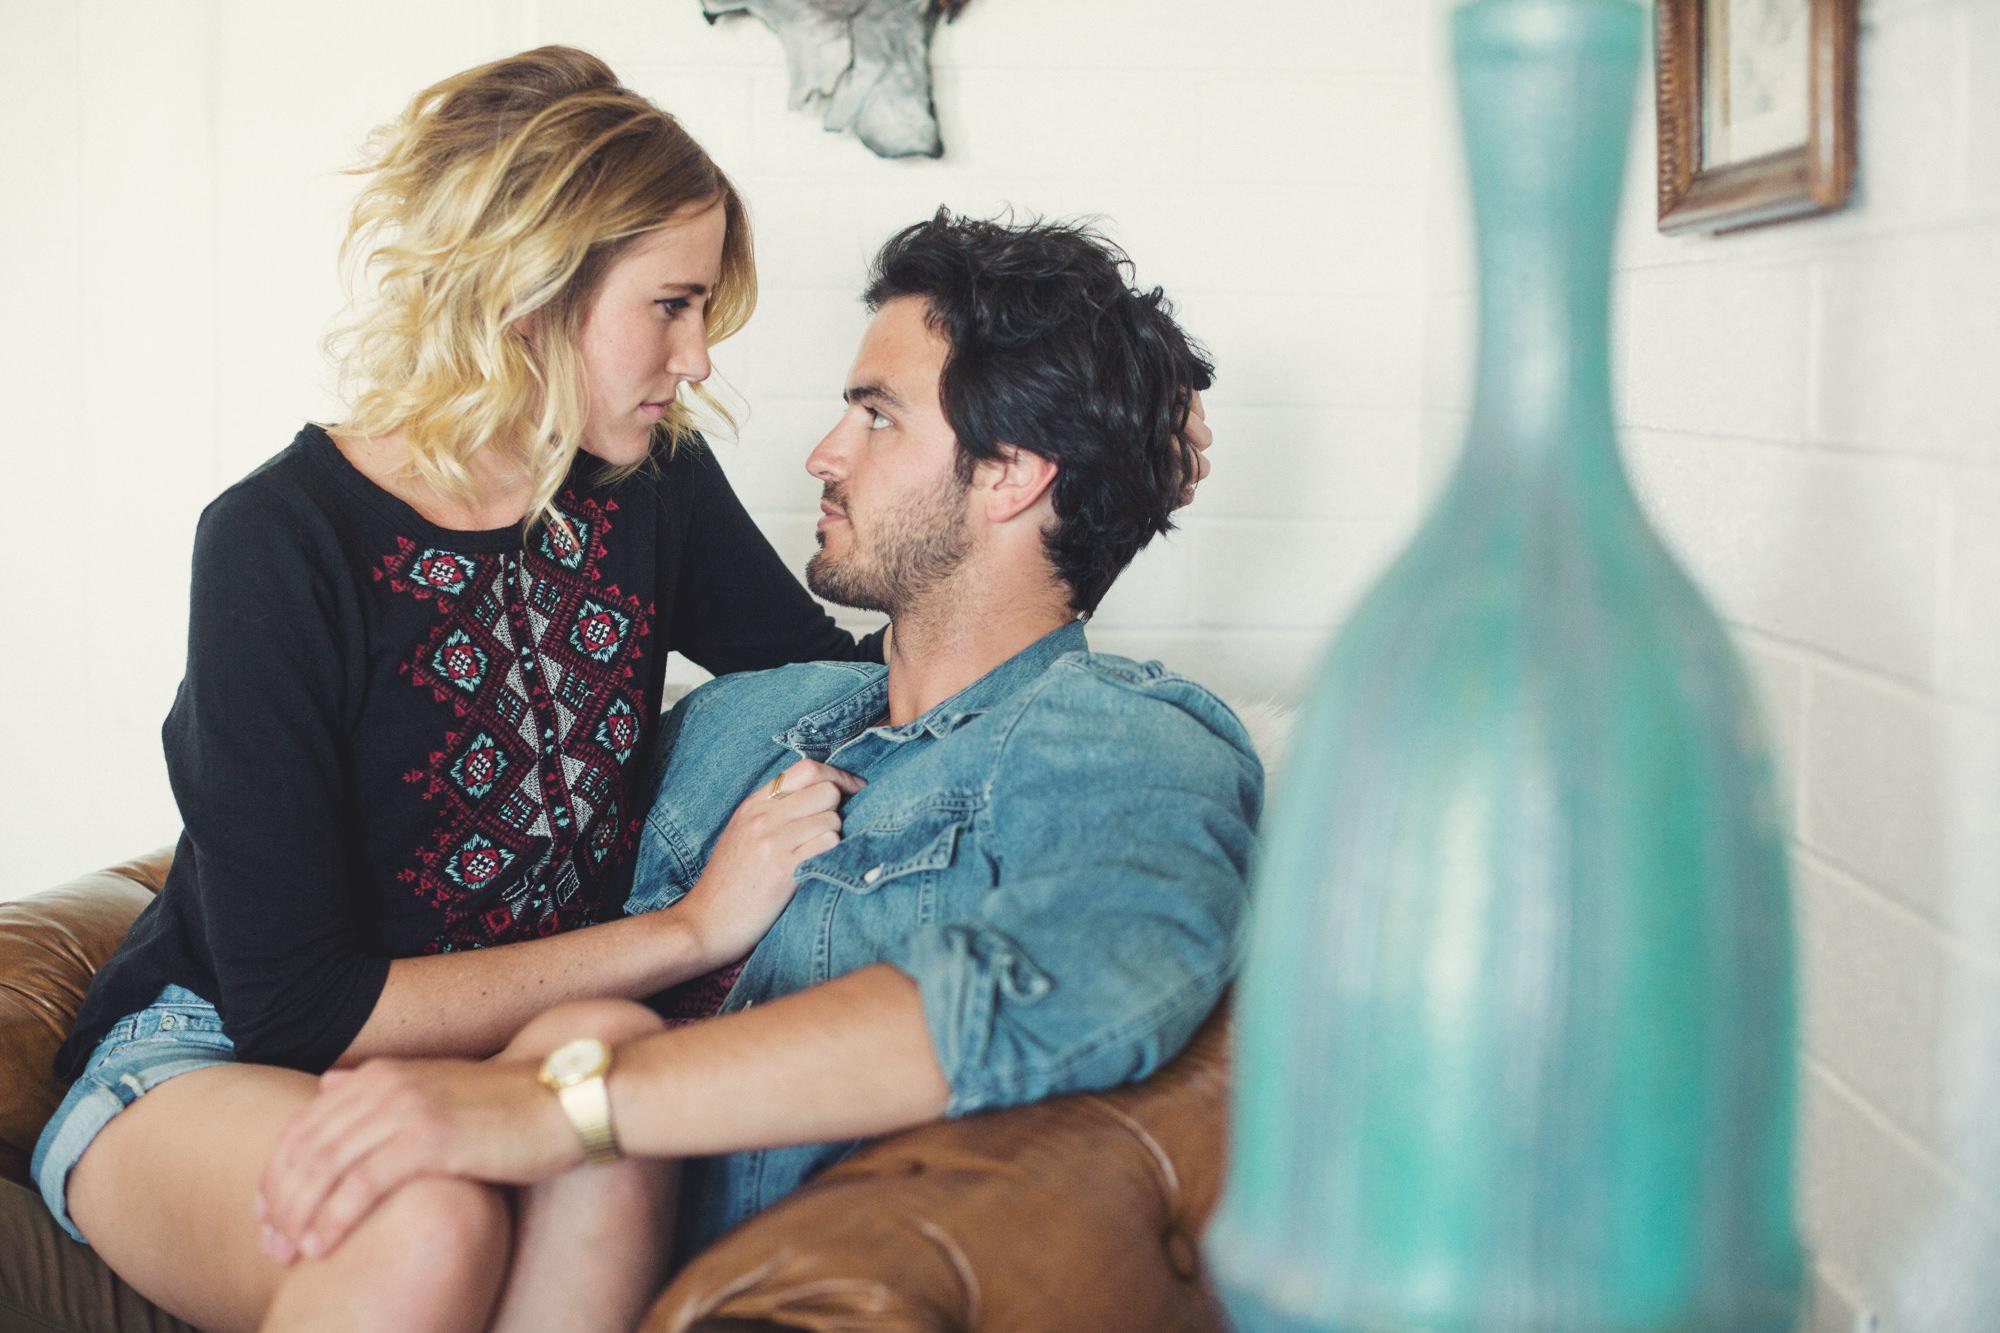 Intimate Couple Session@Anne-Claire Brun 53